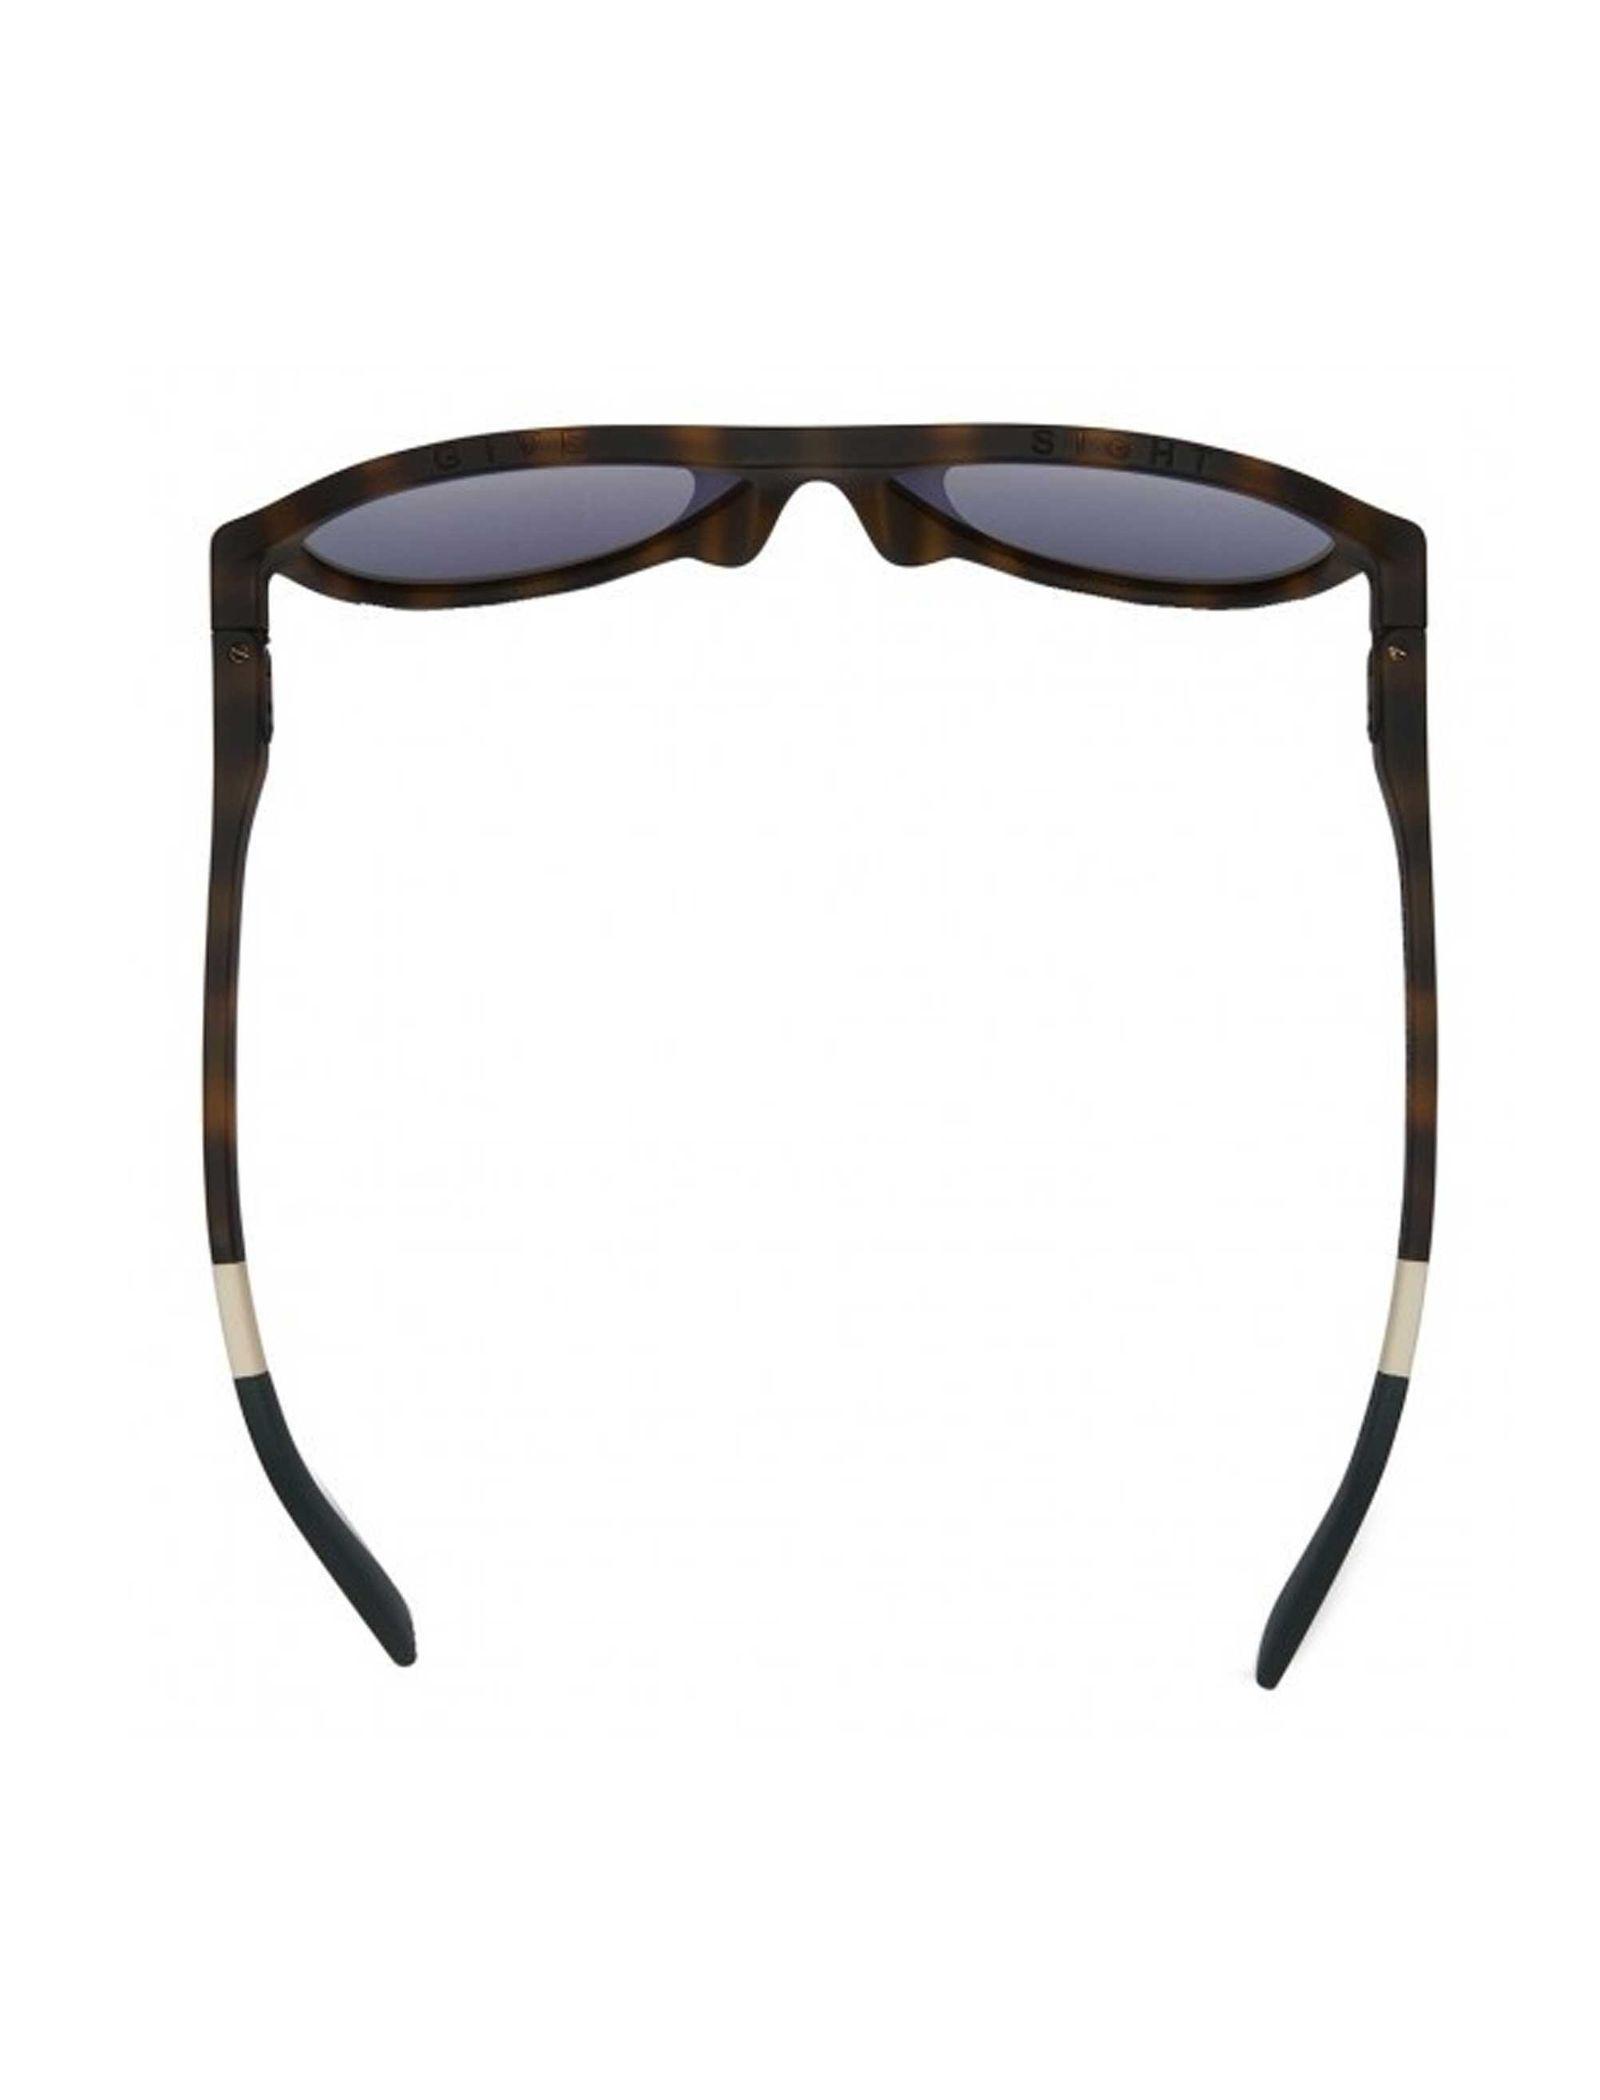 عینک آفتابی خلبانی بزرگسال ZION - تامز - قهوه اي - 5